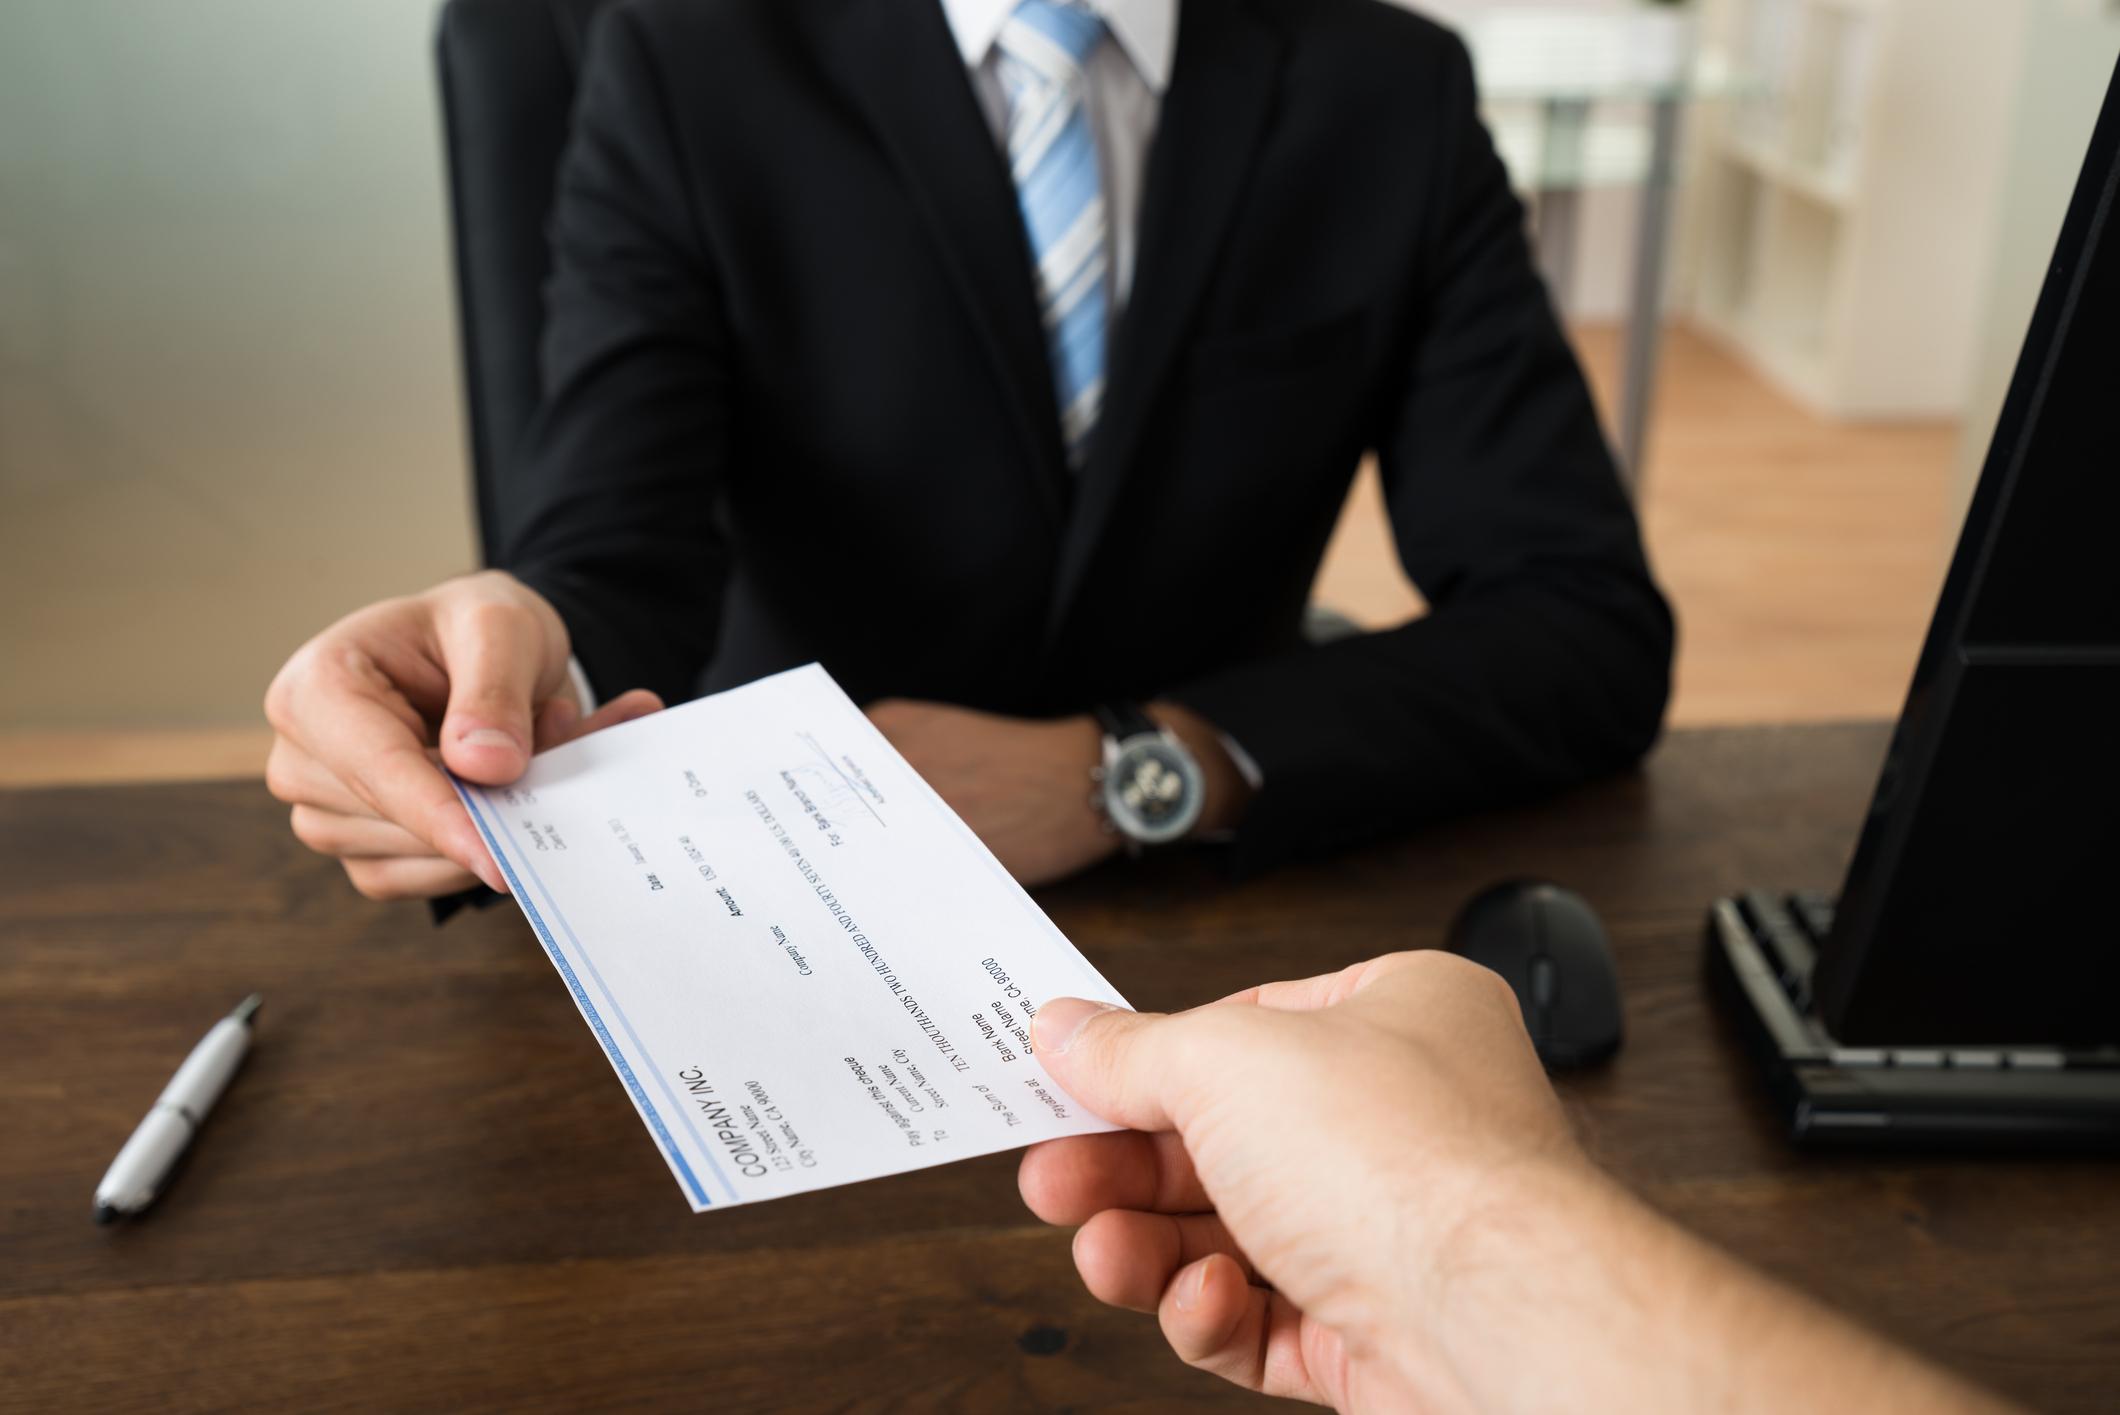 Businessman handing over check